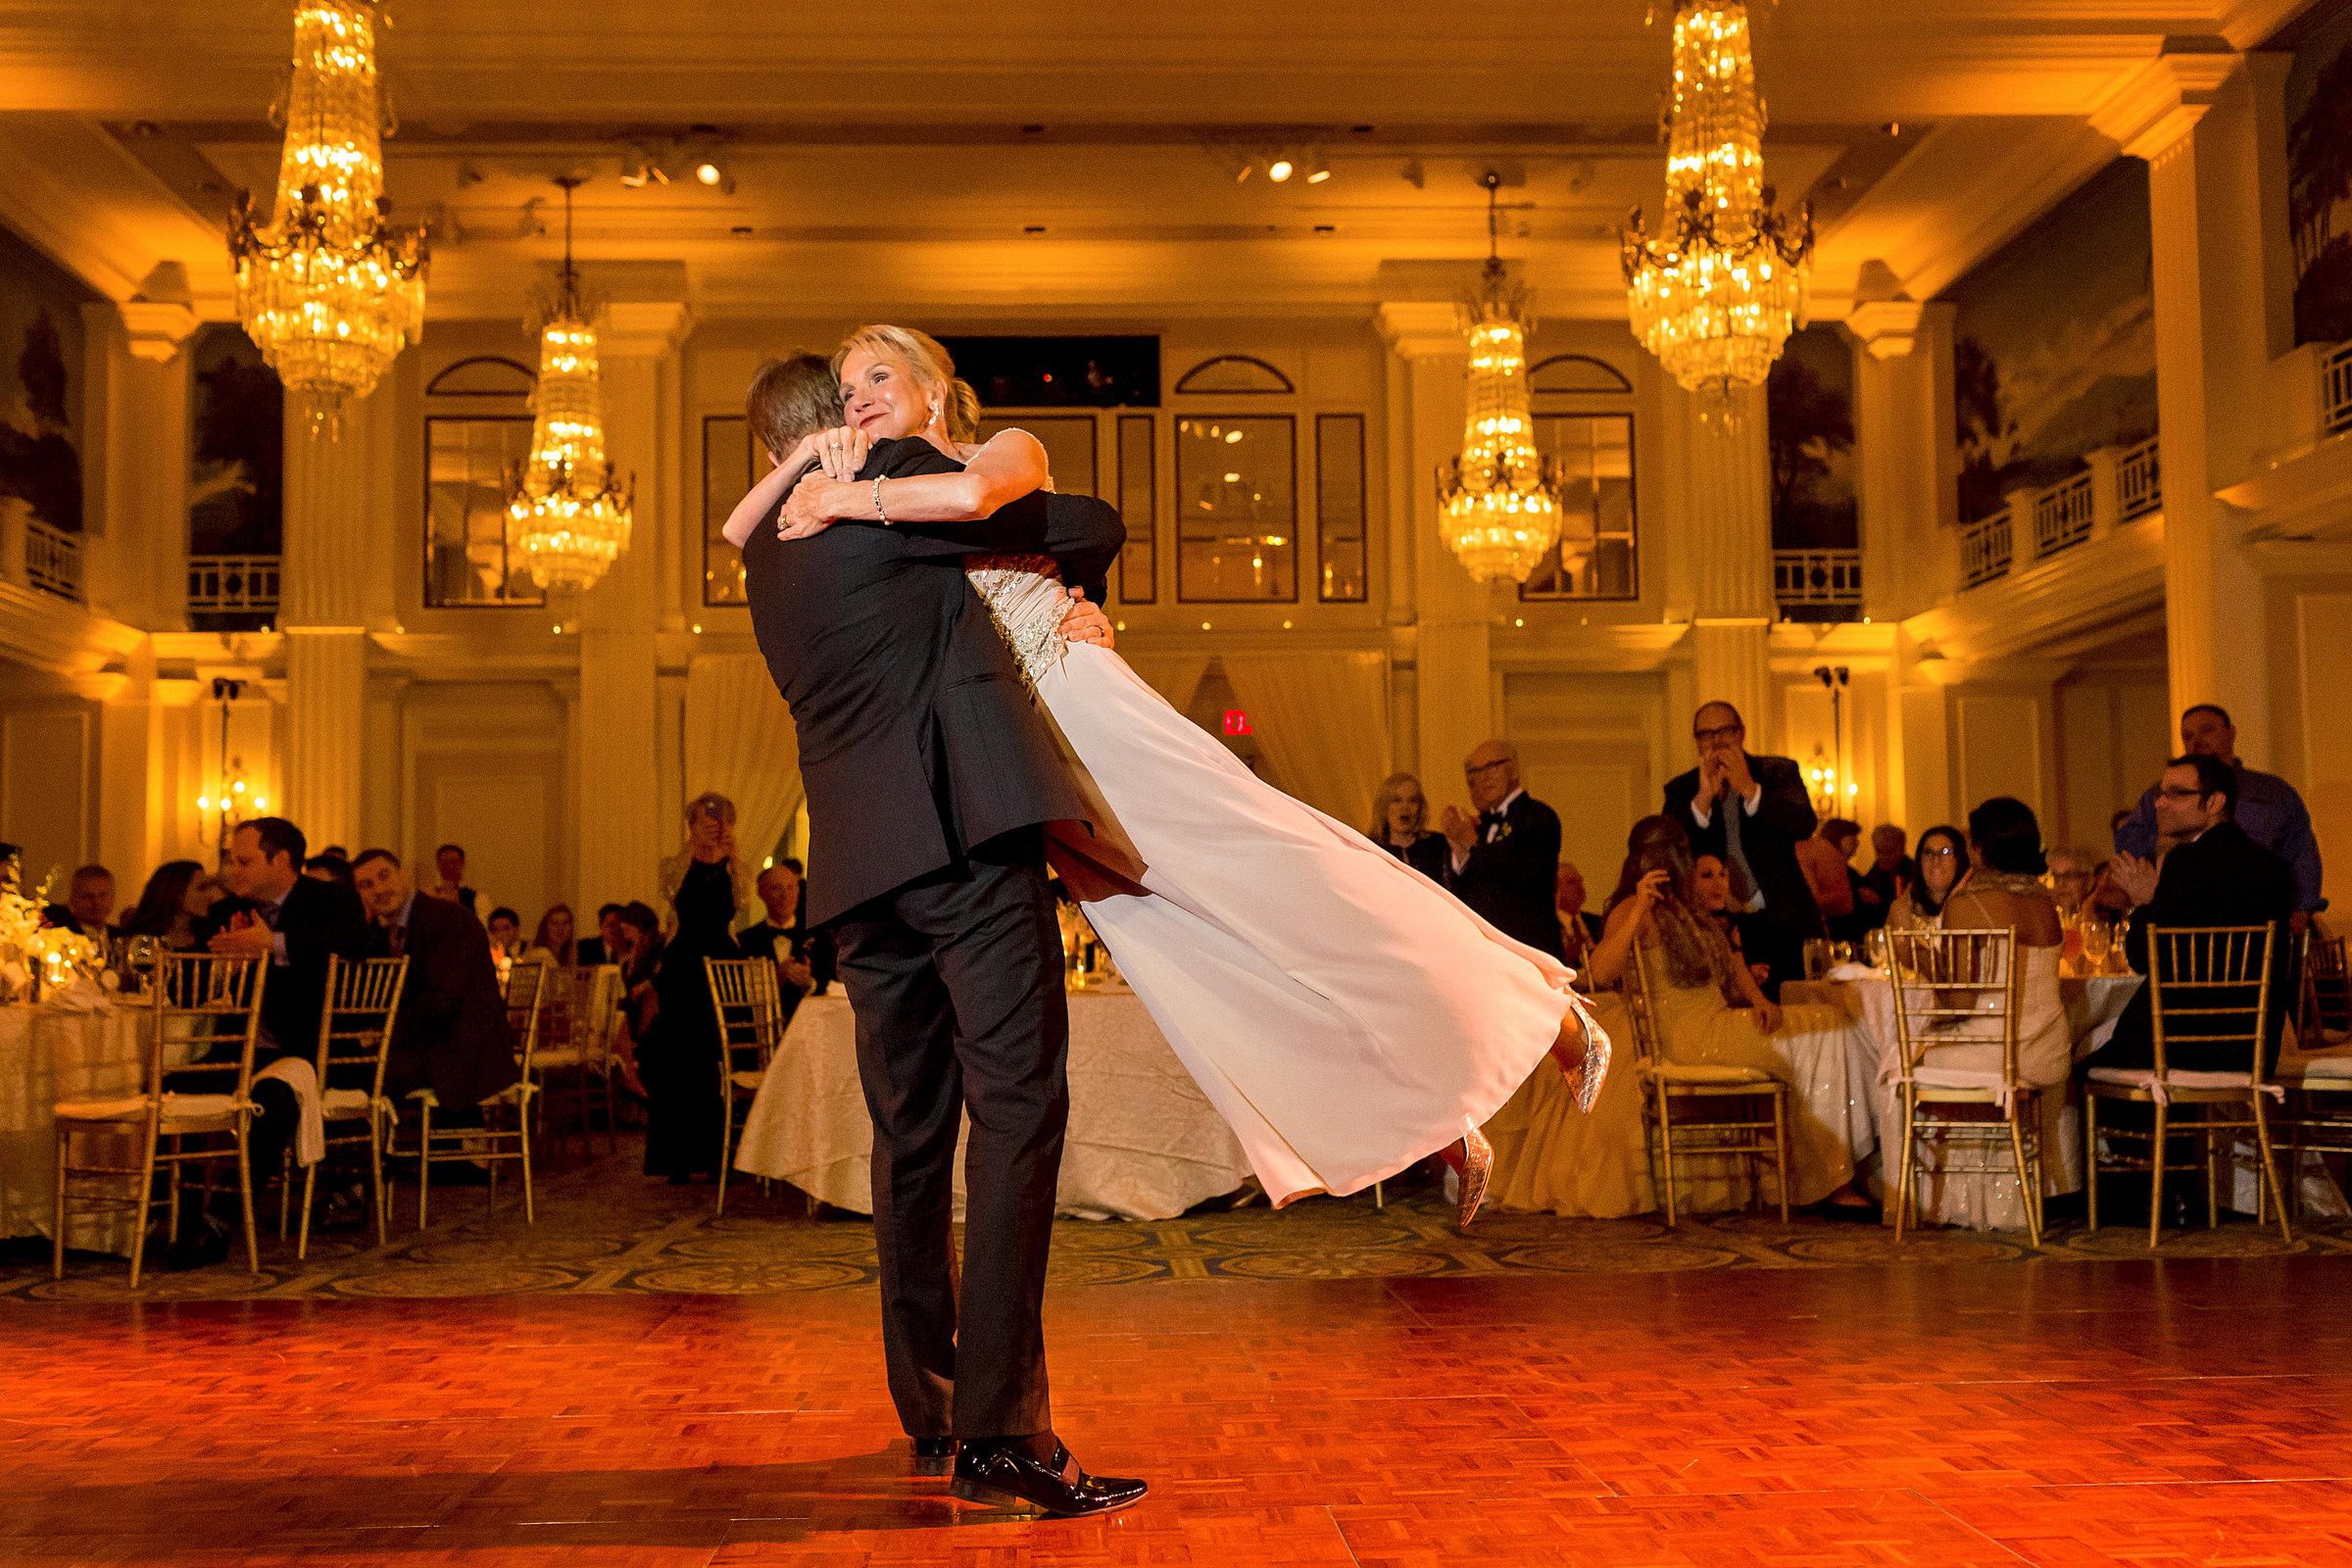 Groom lifts bride in dance - photo by Procopio Photography